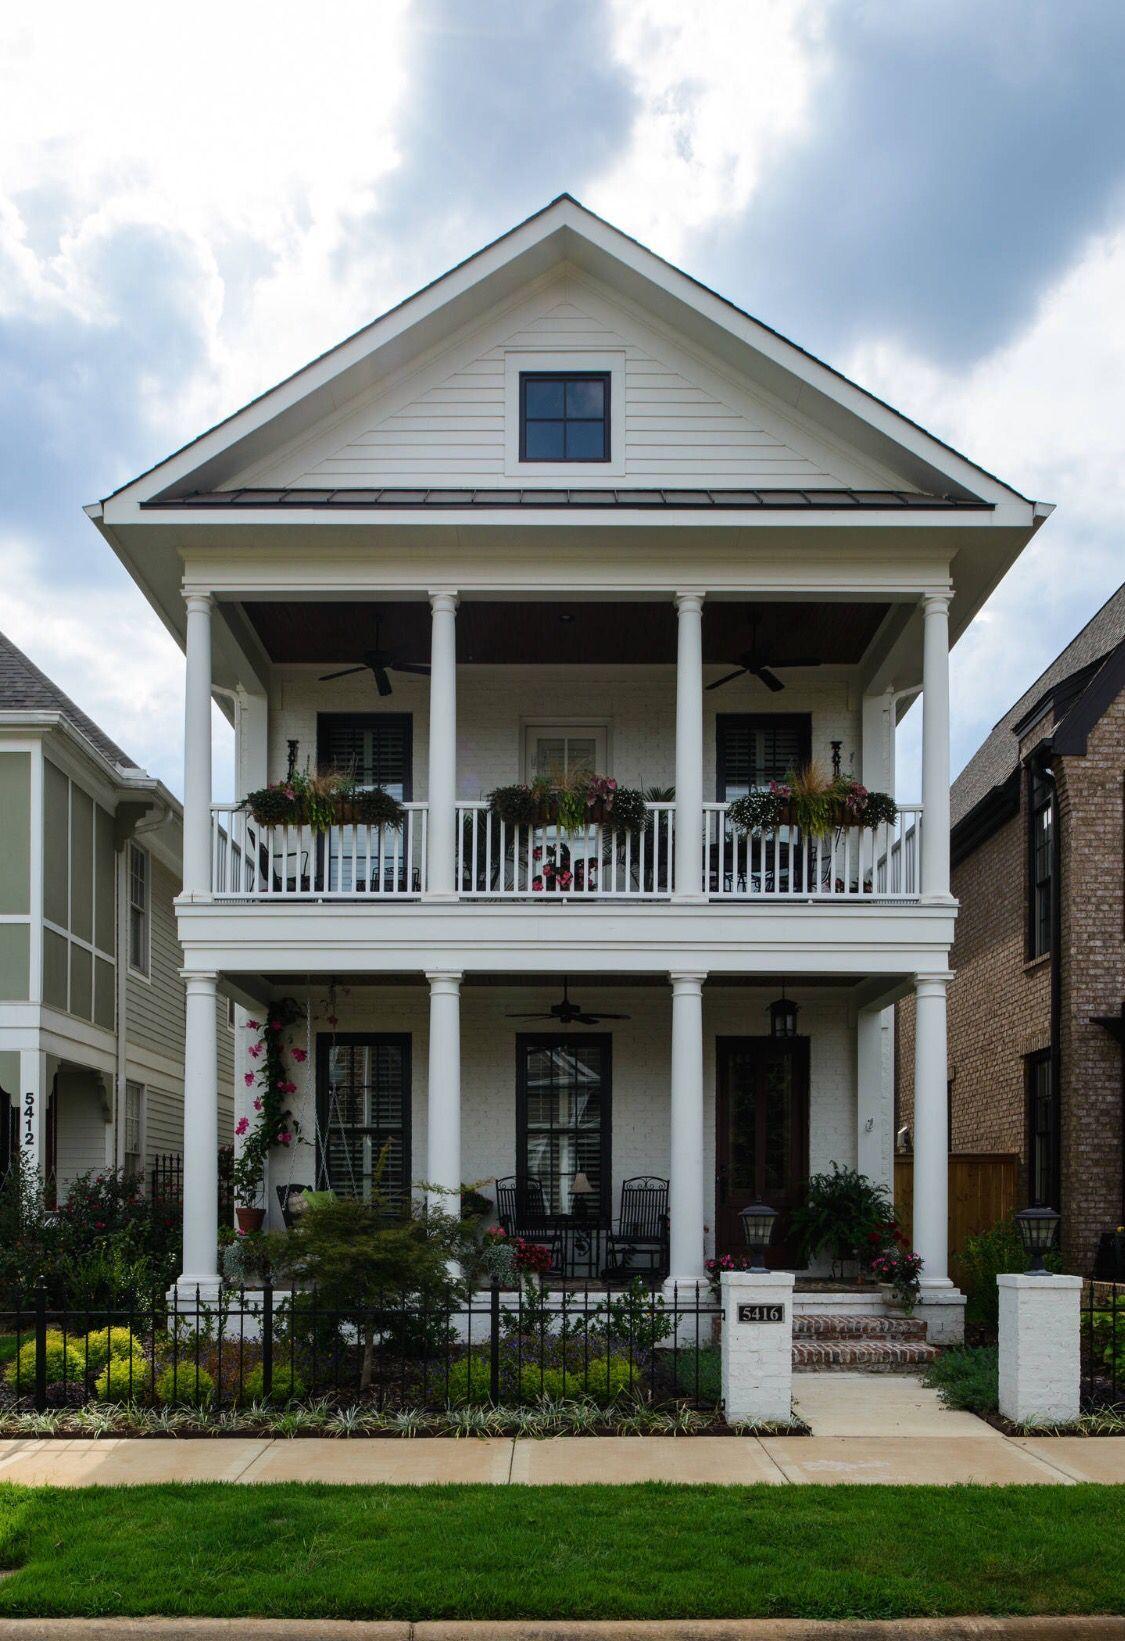 Charleston Style House Plans Beach House Plans House With Porch Porch House Plans